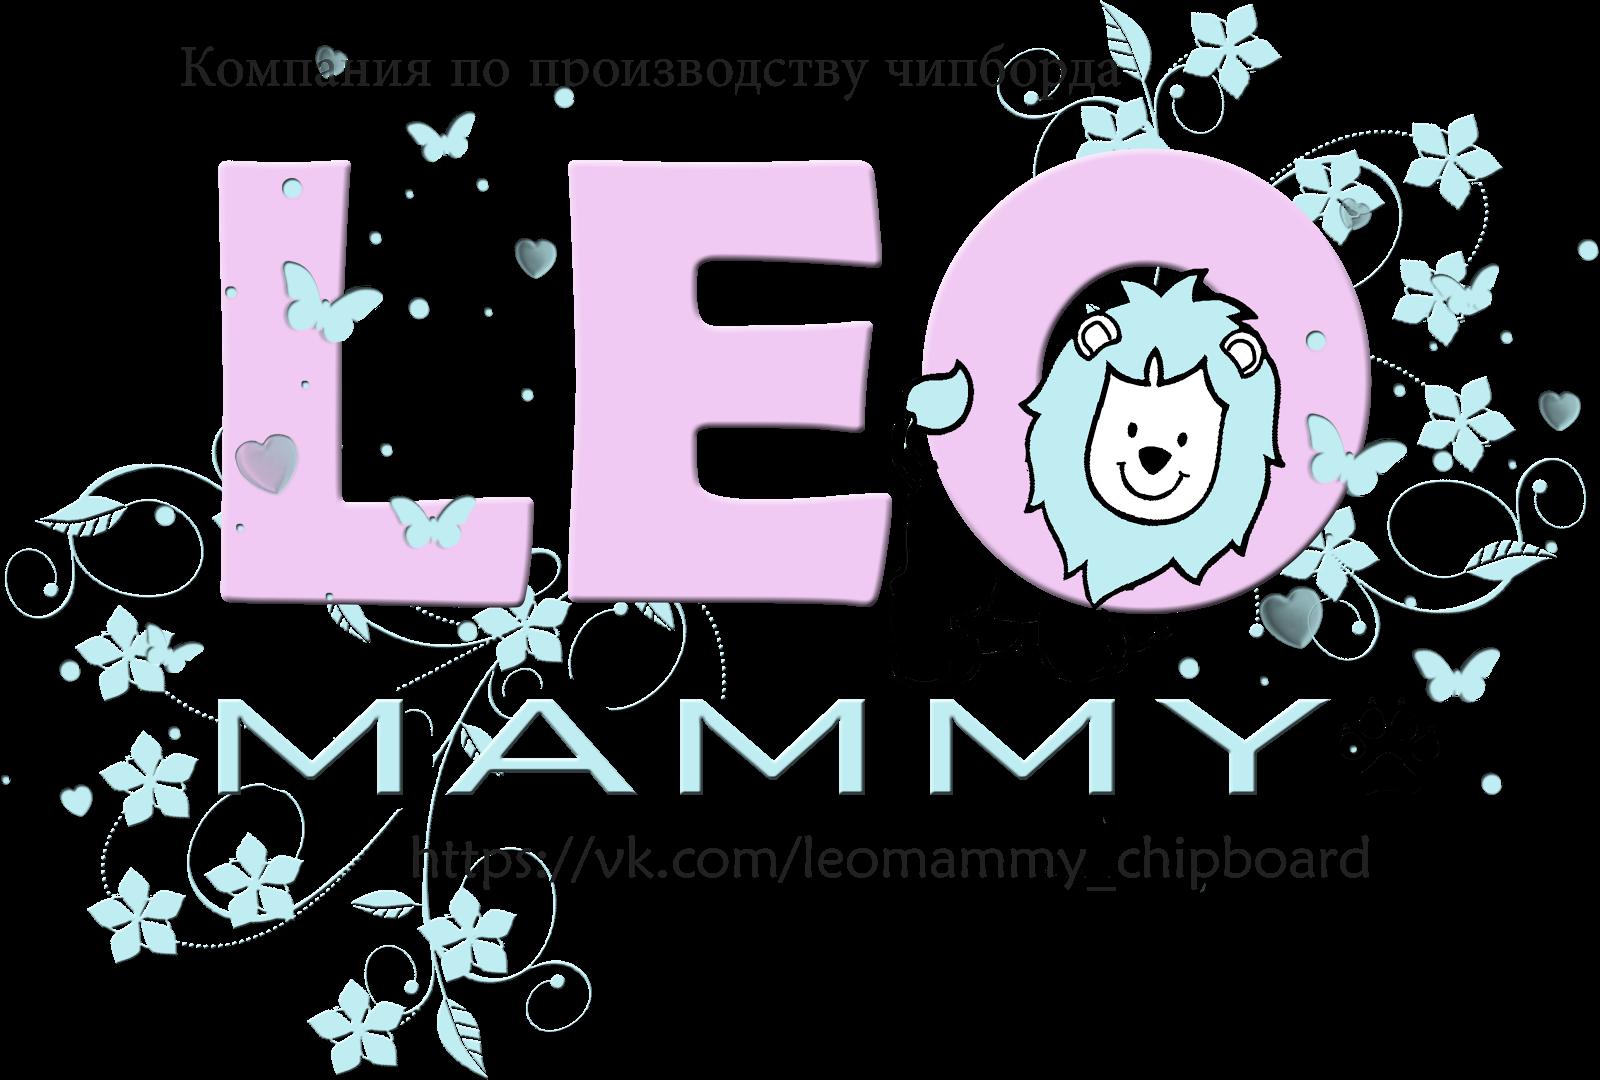 LEO MAMMY